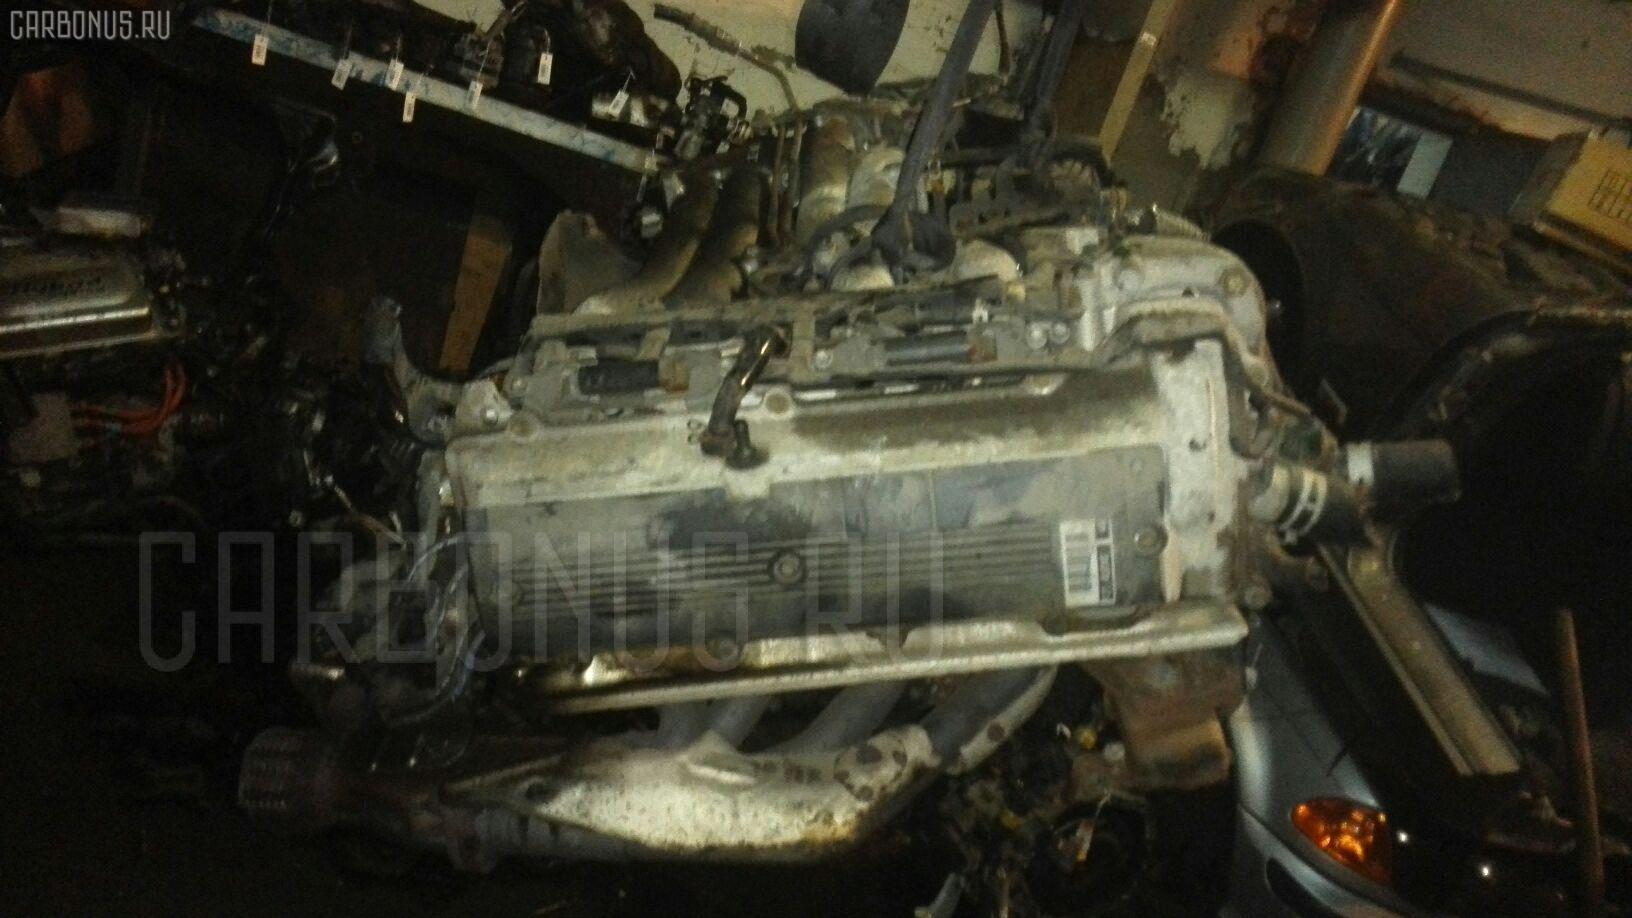 Двигатель TOYOTA ESTIMA EMINA TCR20G 2TZ-FE Фото 3